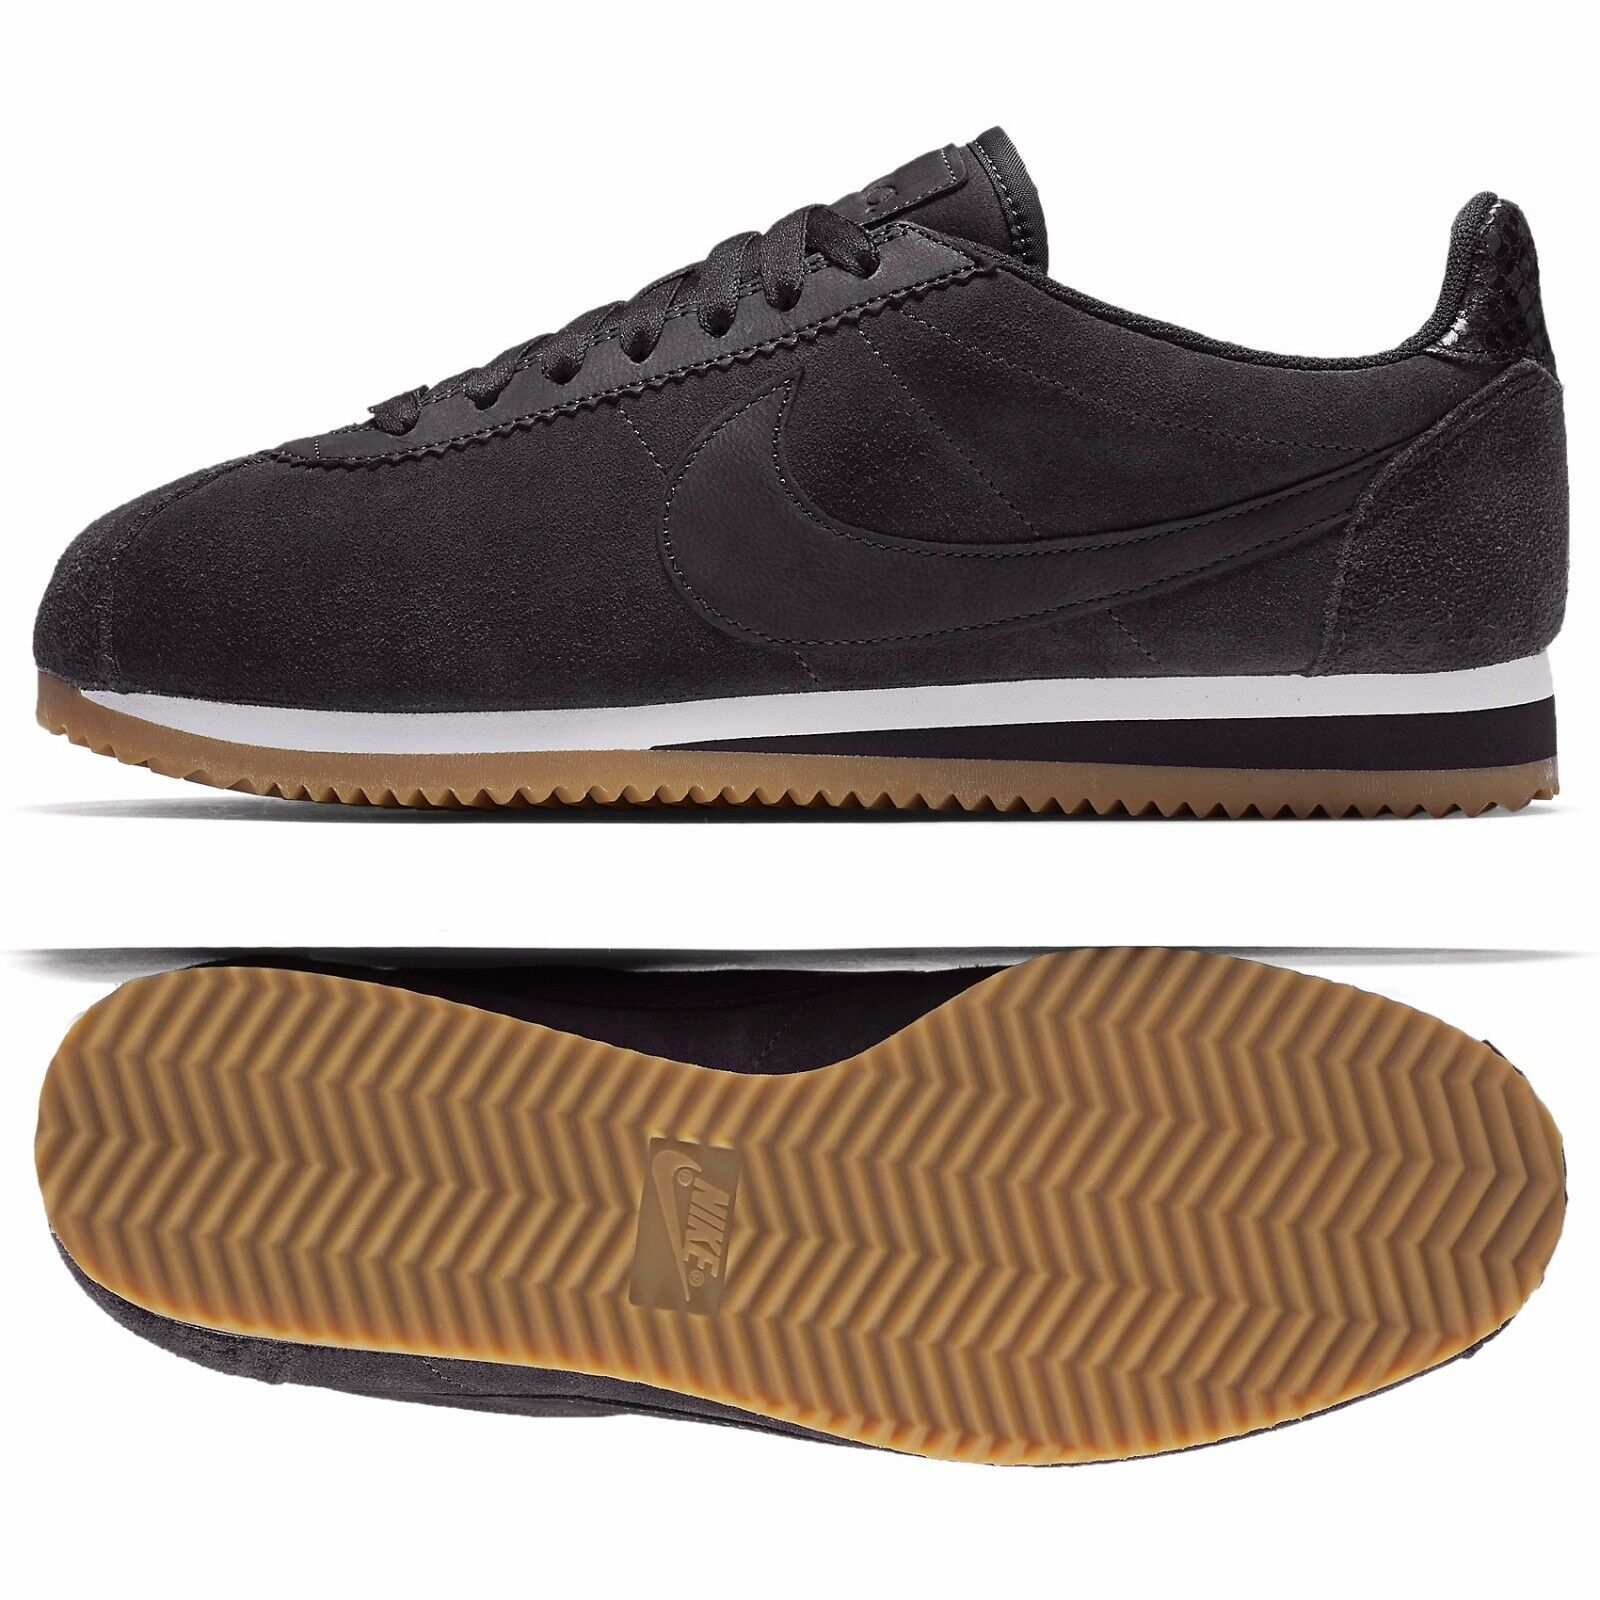 Nike WMNS Classic Cortez Premium ALC AH5206-001 Oil Grey Leather Women's Shoes The latest discount shoes for men and women